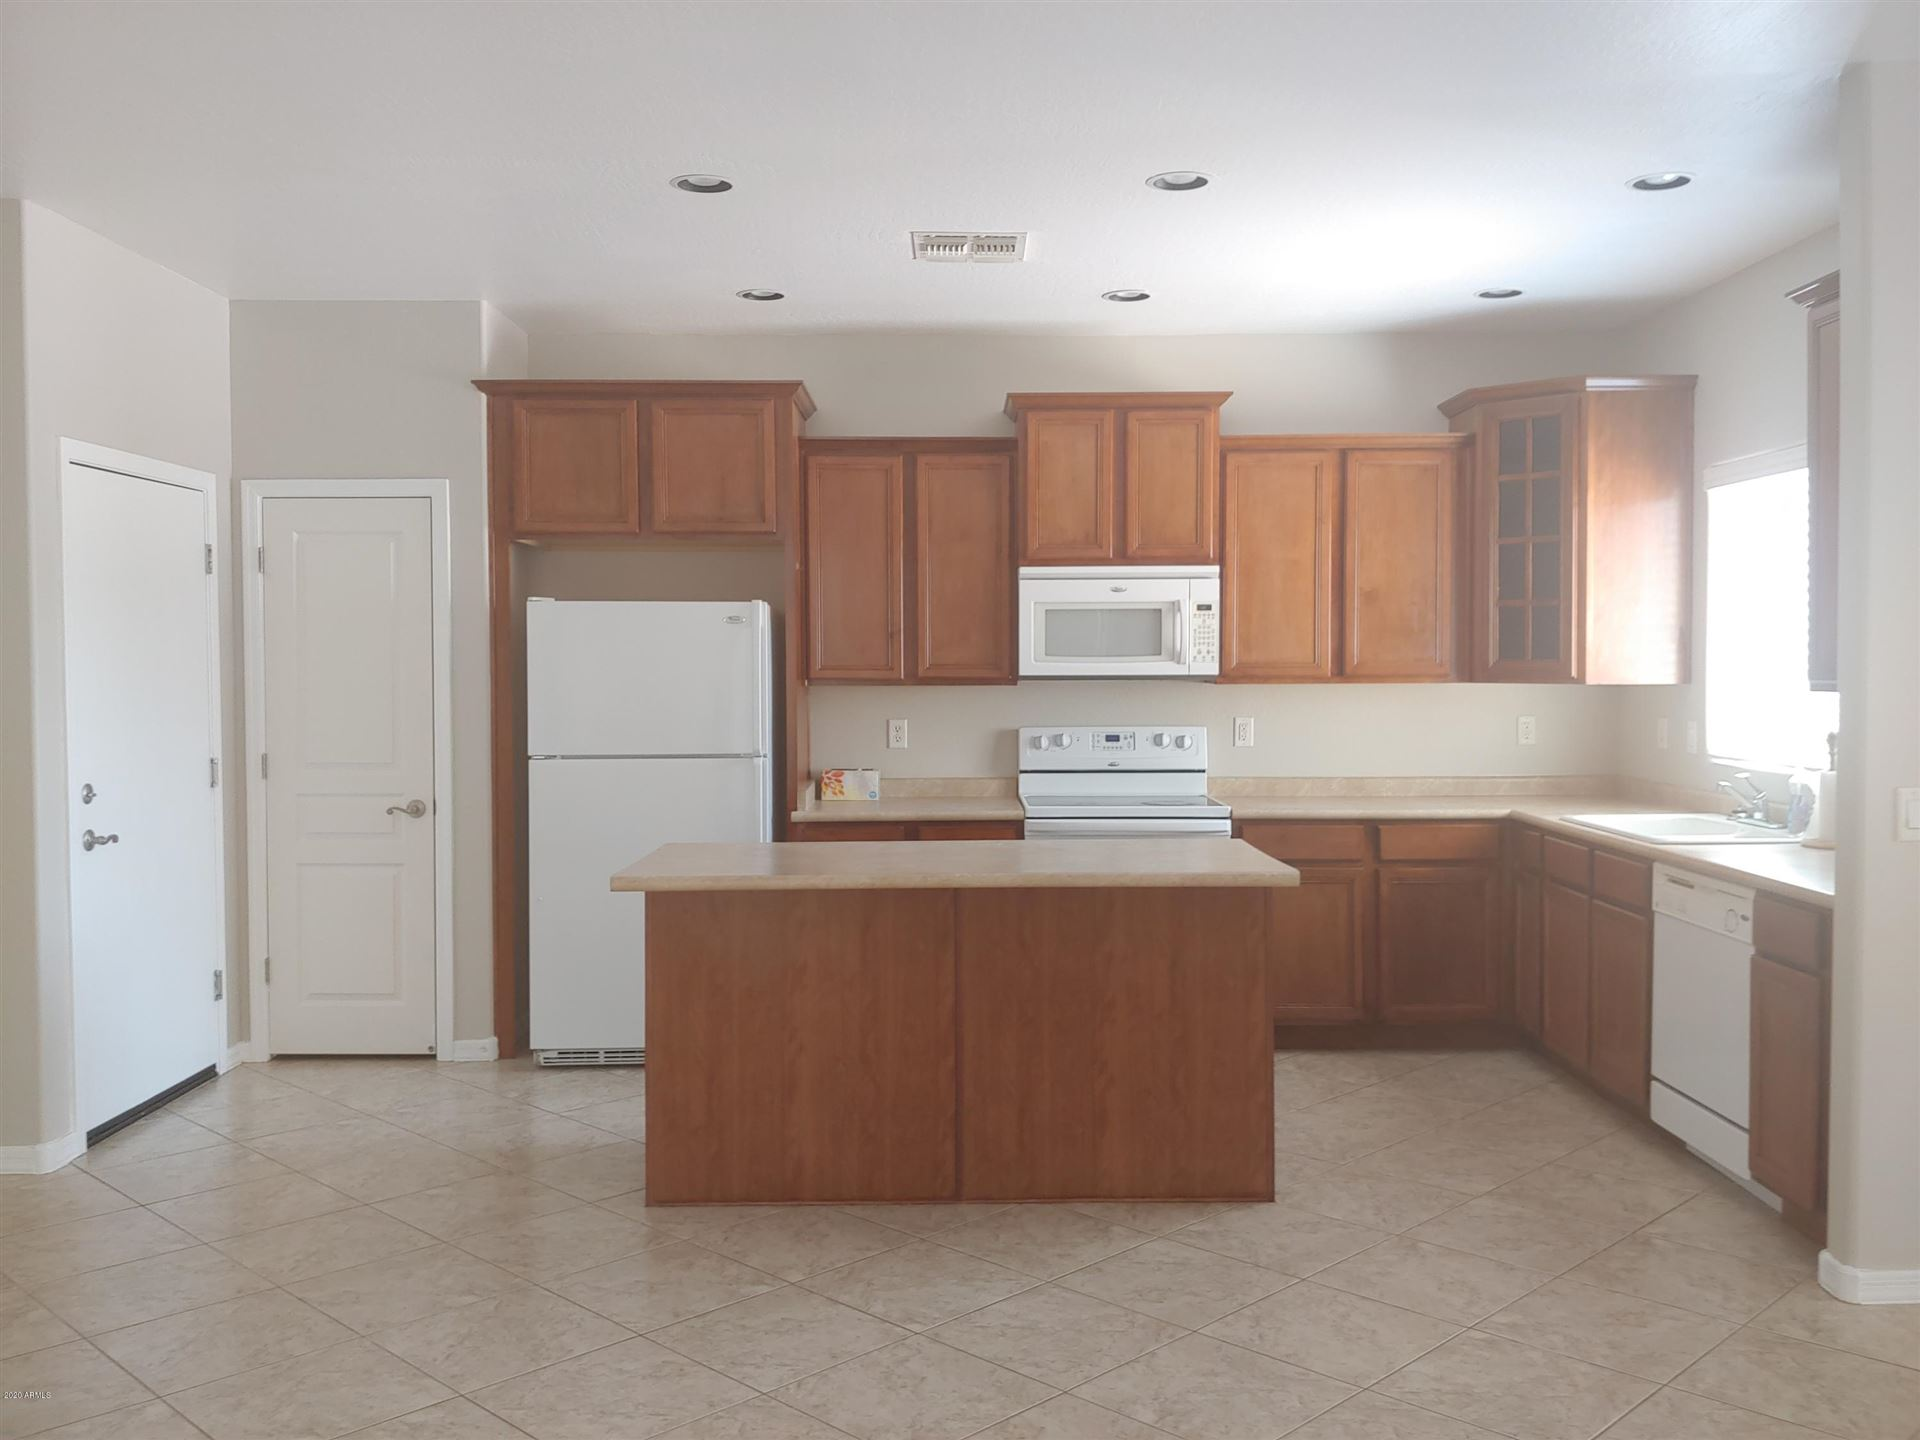 Photo of 1086 S Sacramento Place, Chandler, AZ 85286 (MLS # 6272341)